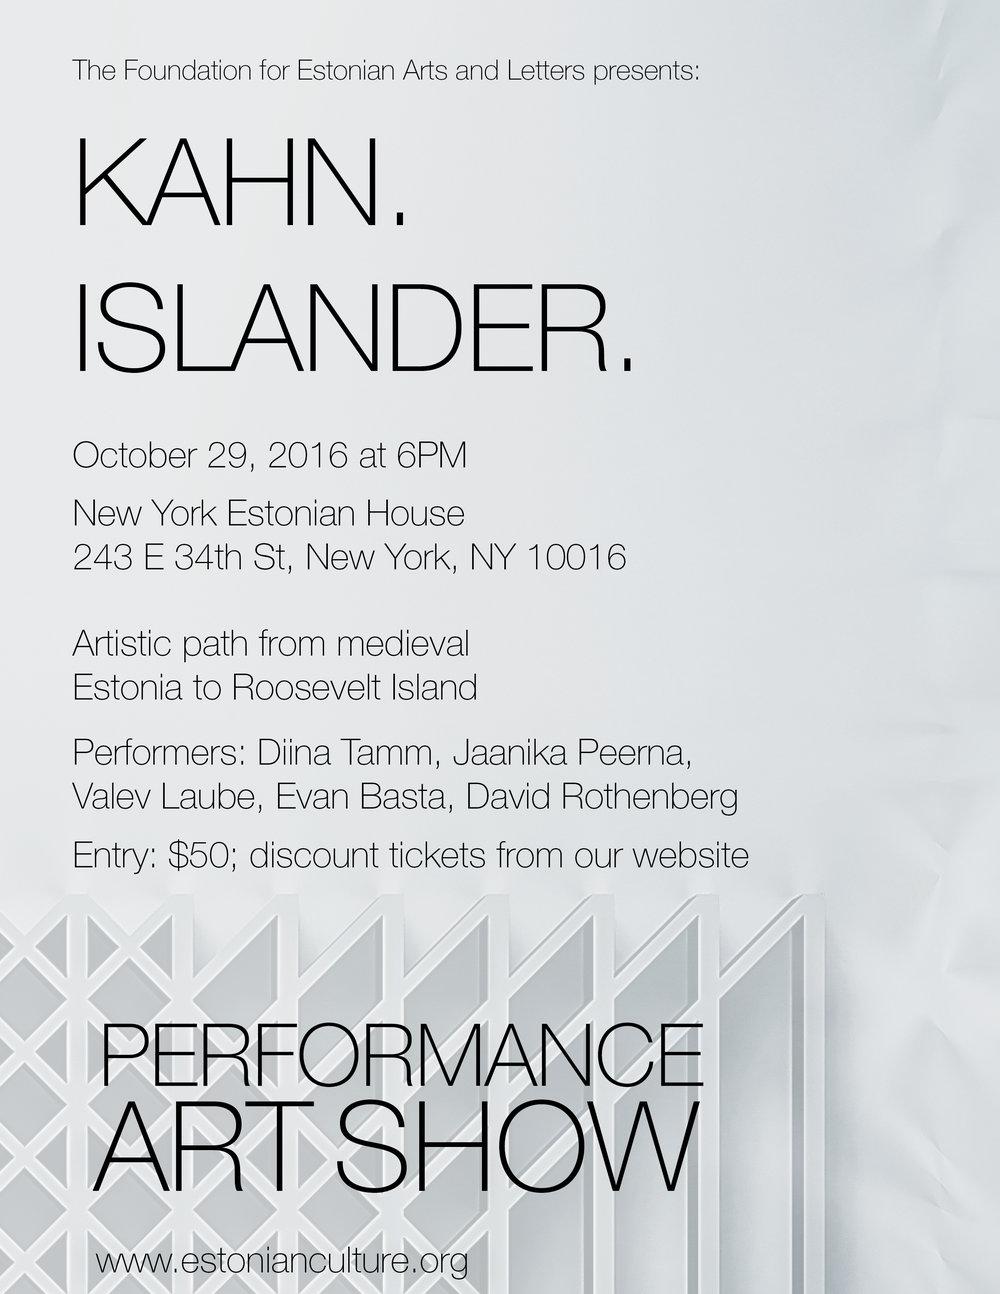 Kahn Islander - performance